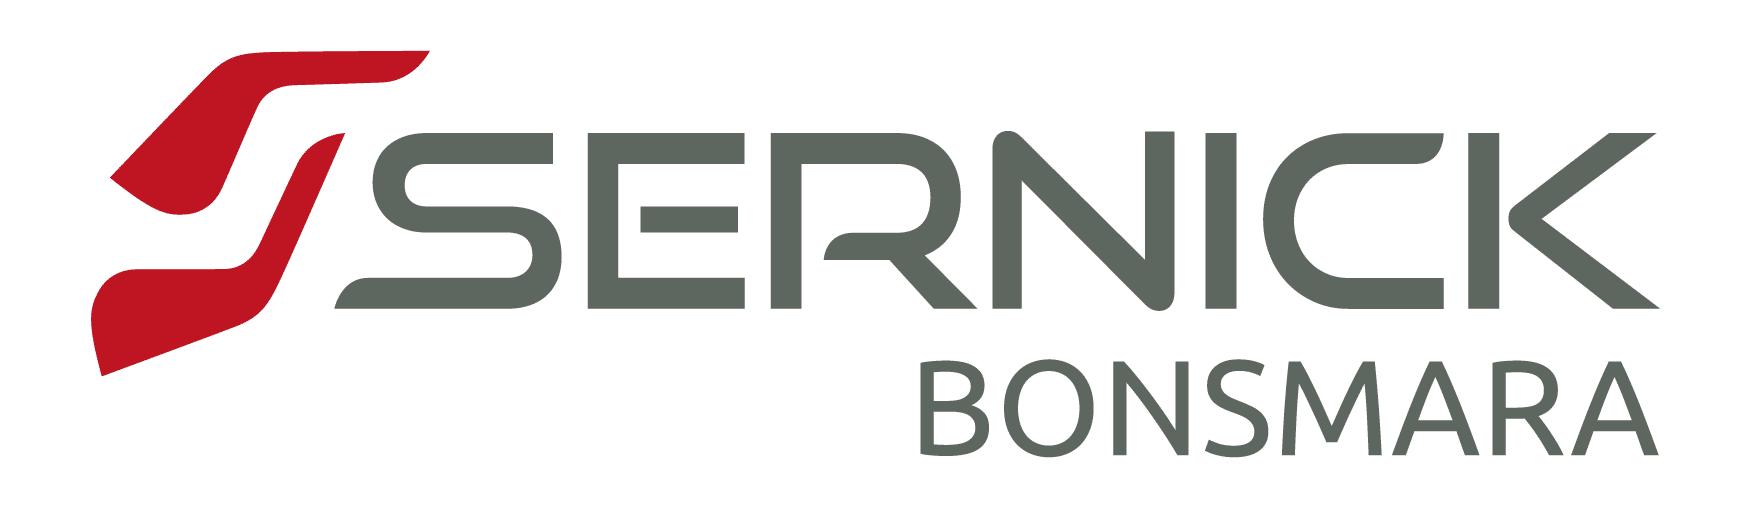 Sernick Bonsmara Logo-01